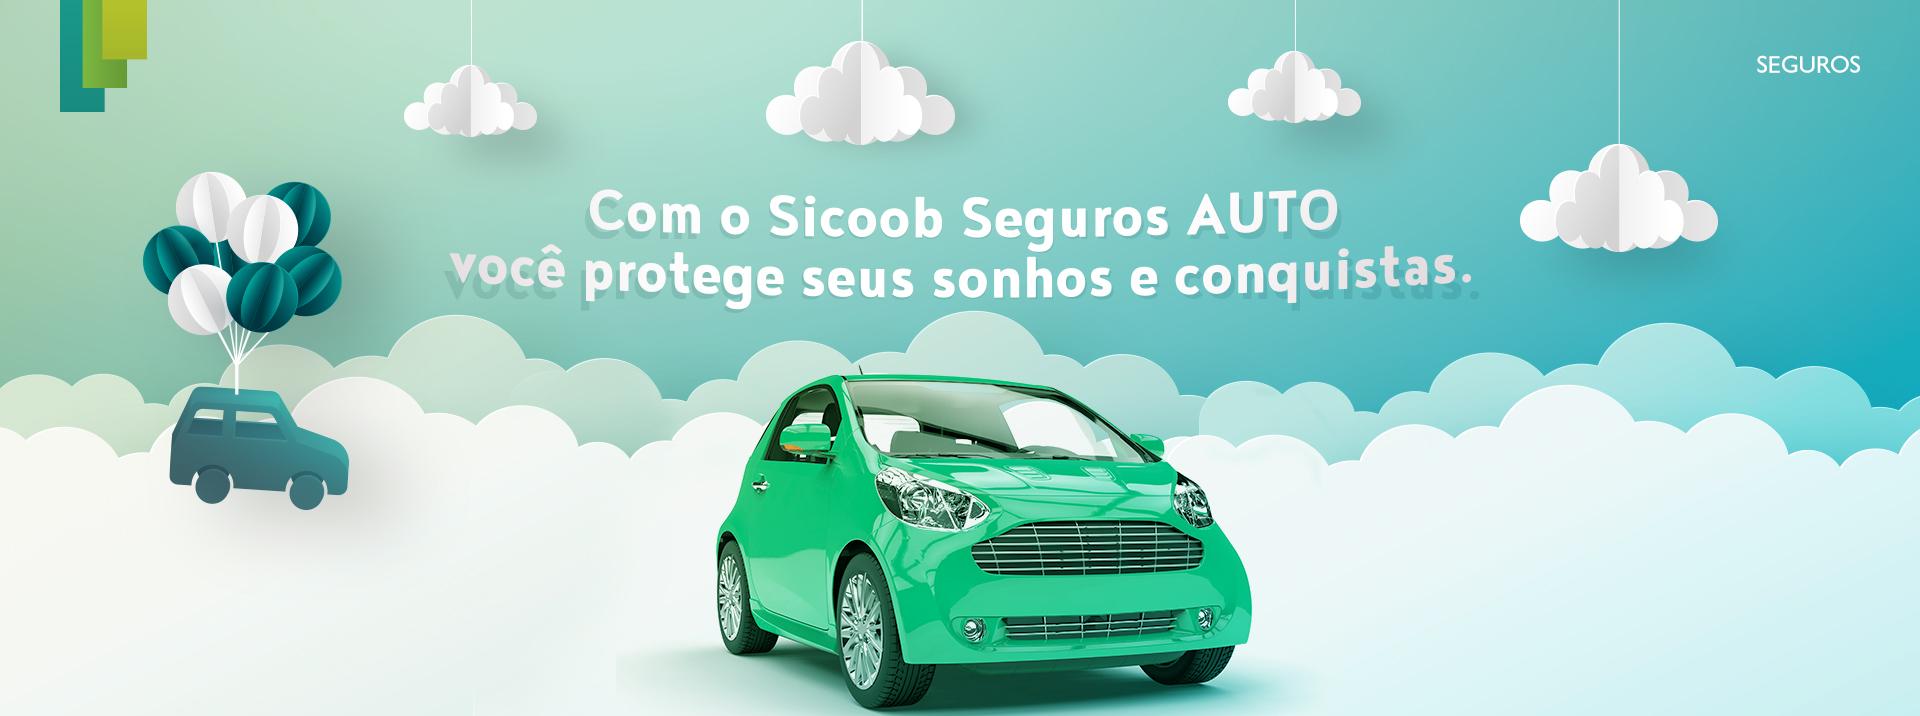 Sguro-Auto_1920x716px_SemLogo